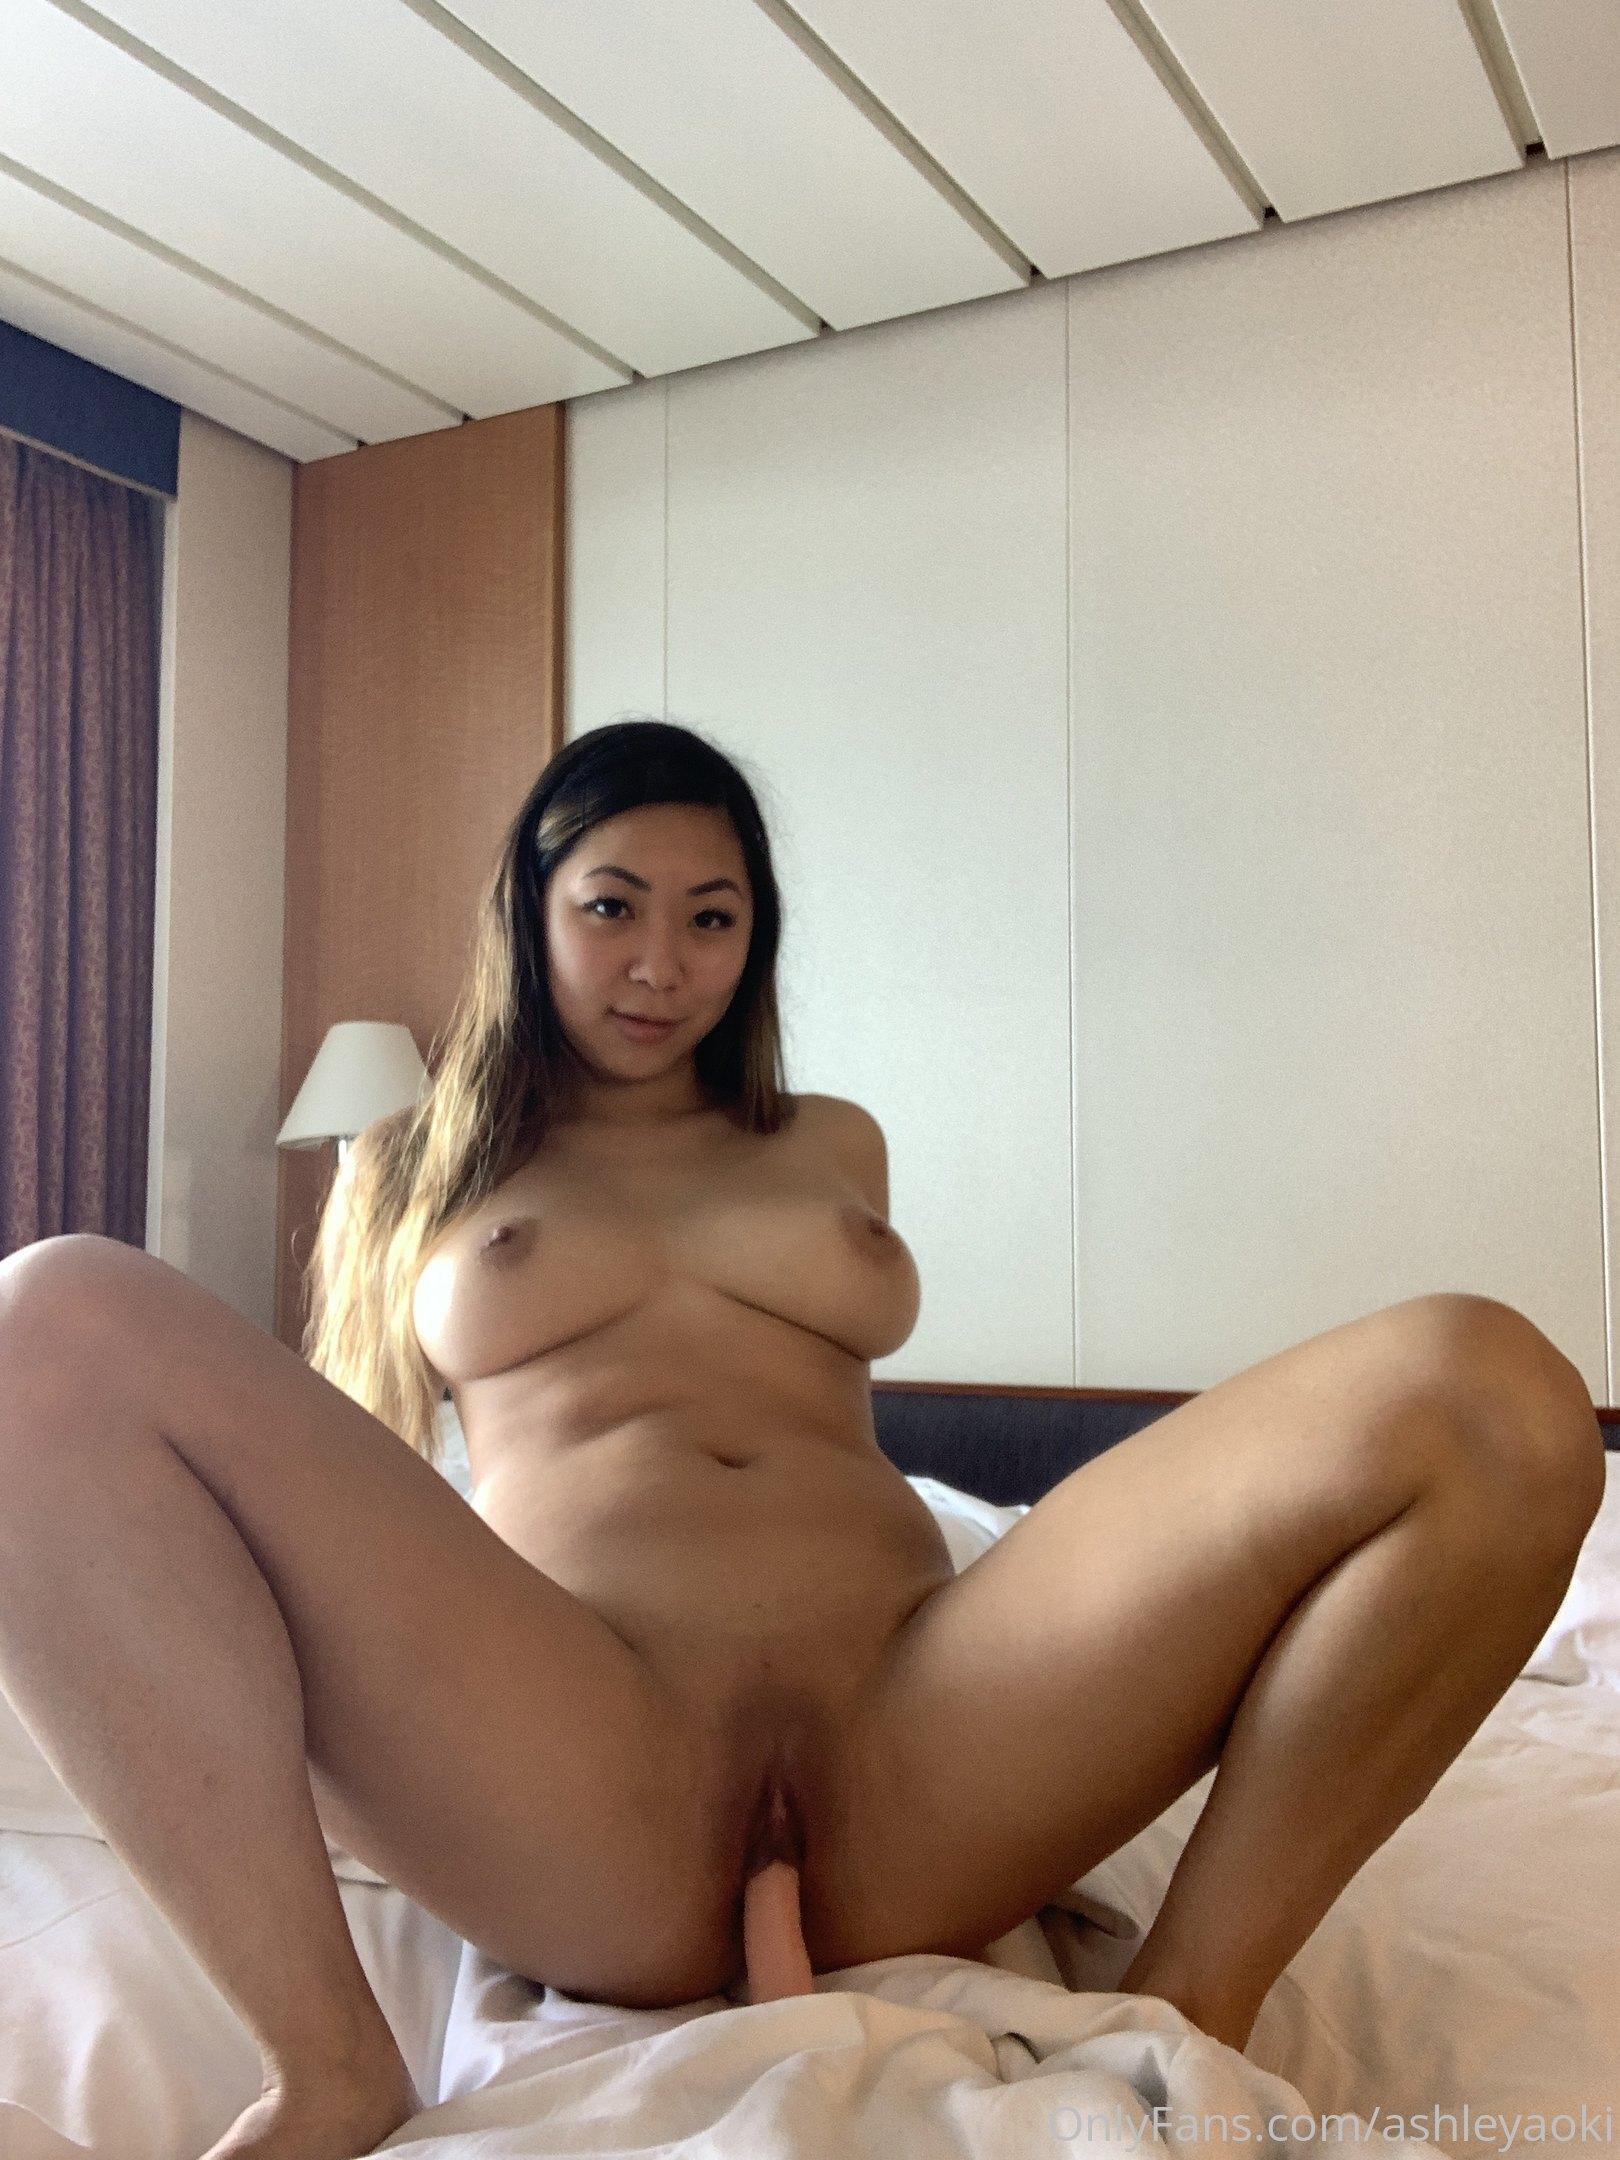 Ashley Aoki, Ashleyaoki, Onlyfans Leaks 0121